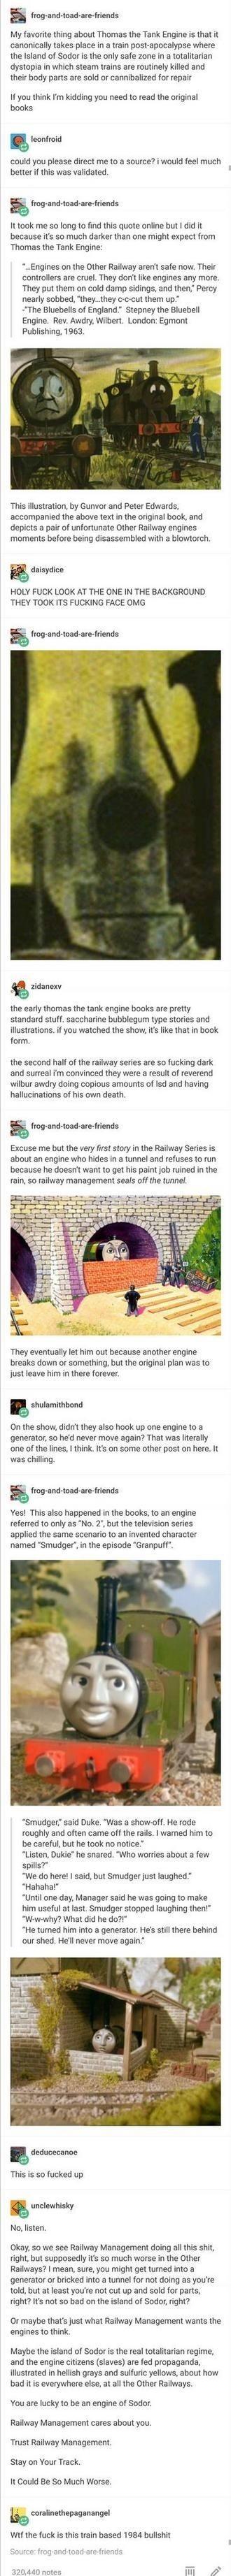 The Dark Side of Thomas the Tank Engine. .. Obligatory